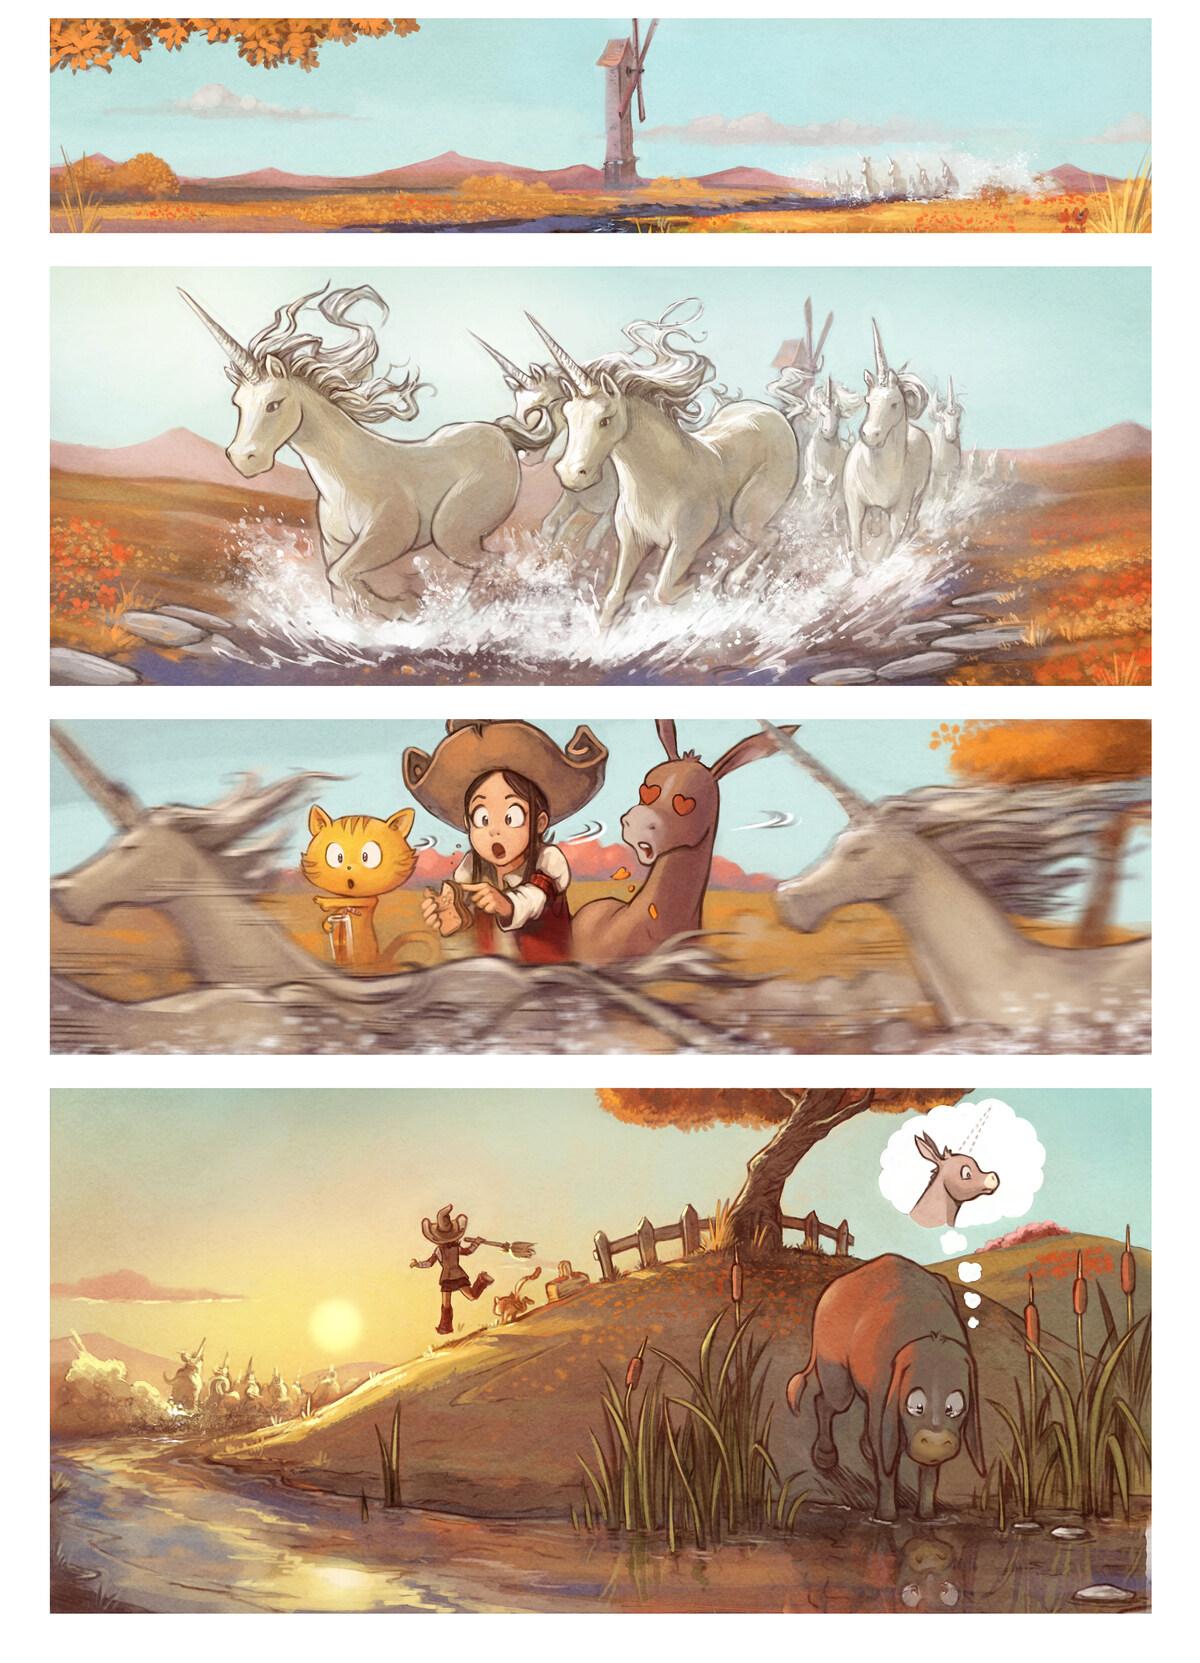 A webcomic page of Pepper&Carrot, pagbu 20 [jb], papri 2